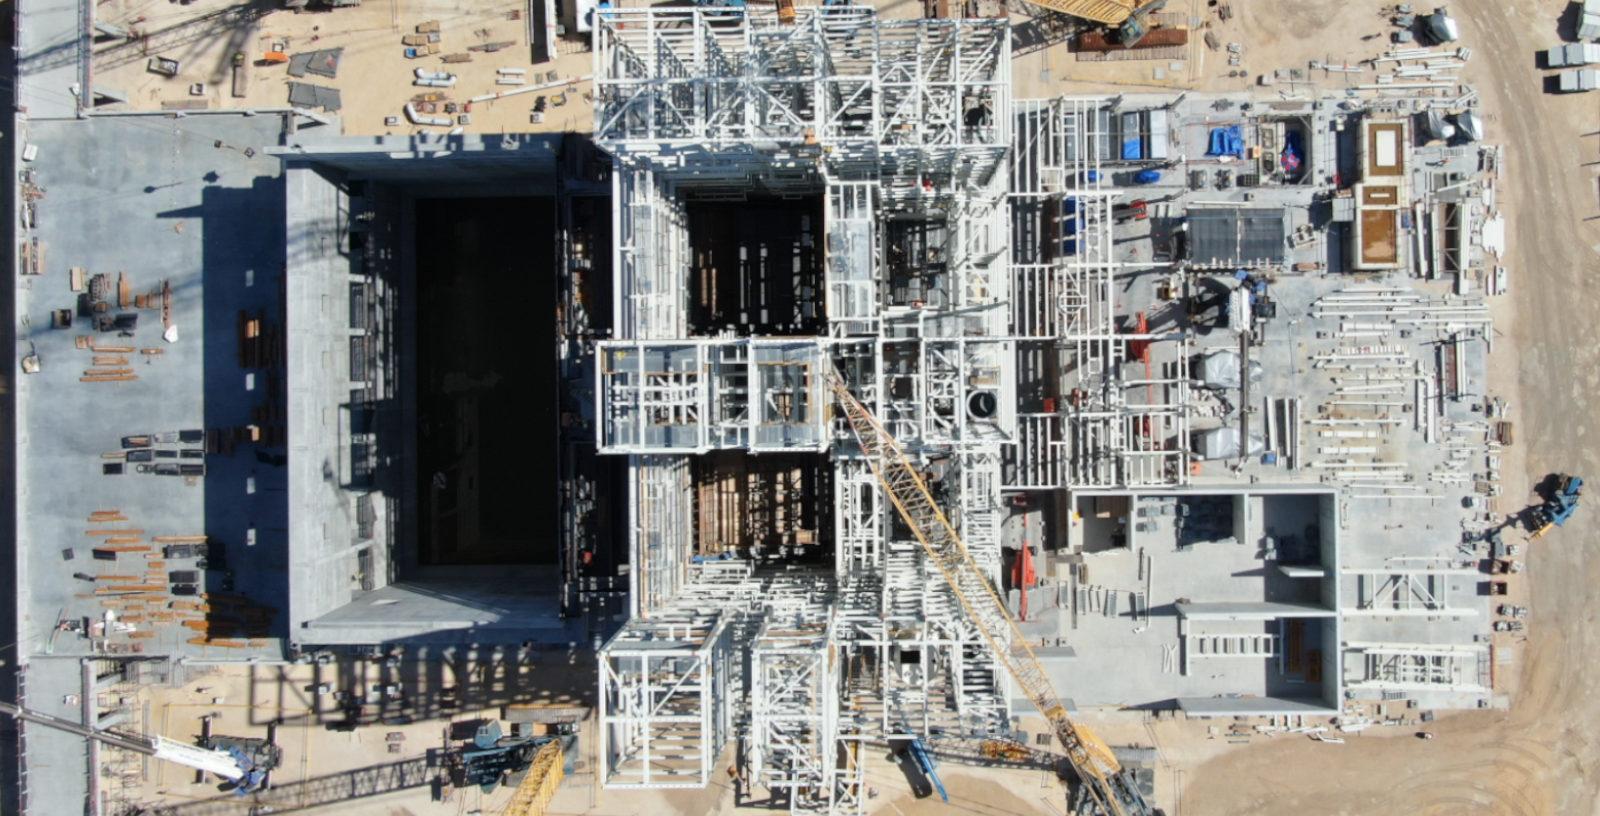 Kwinana_Waste_To_Energy_Plant_Australia_Acciona_IDOM_18